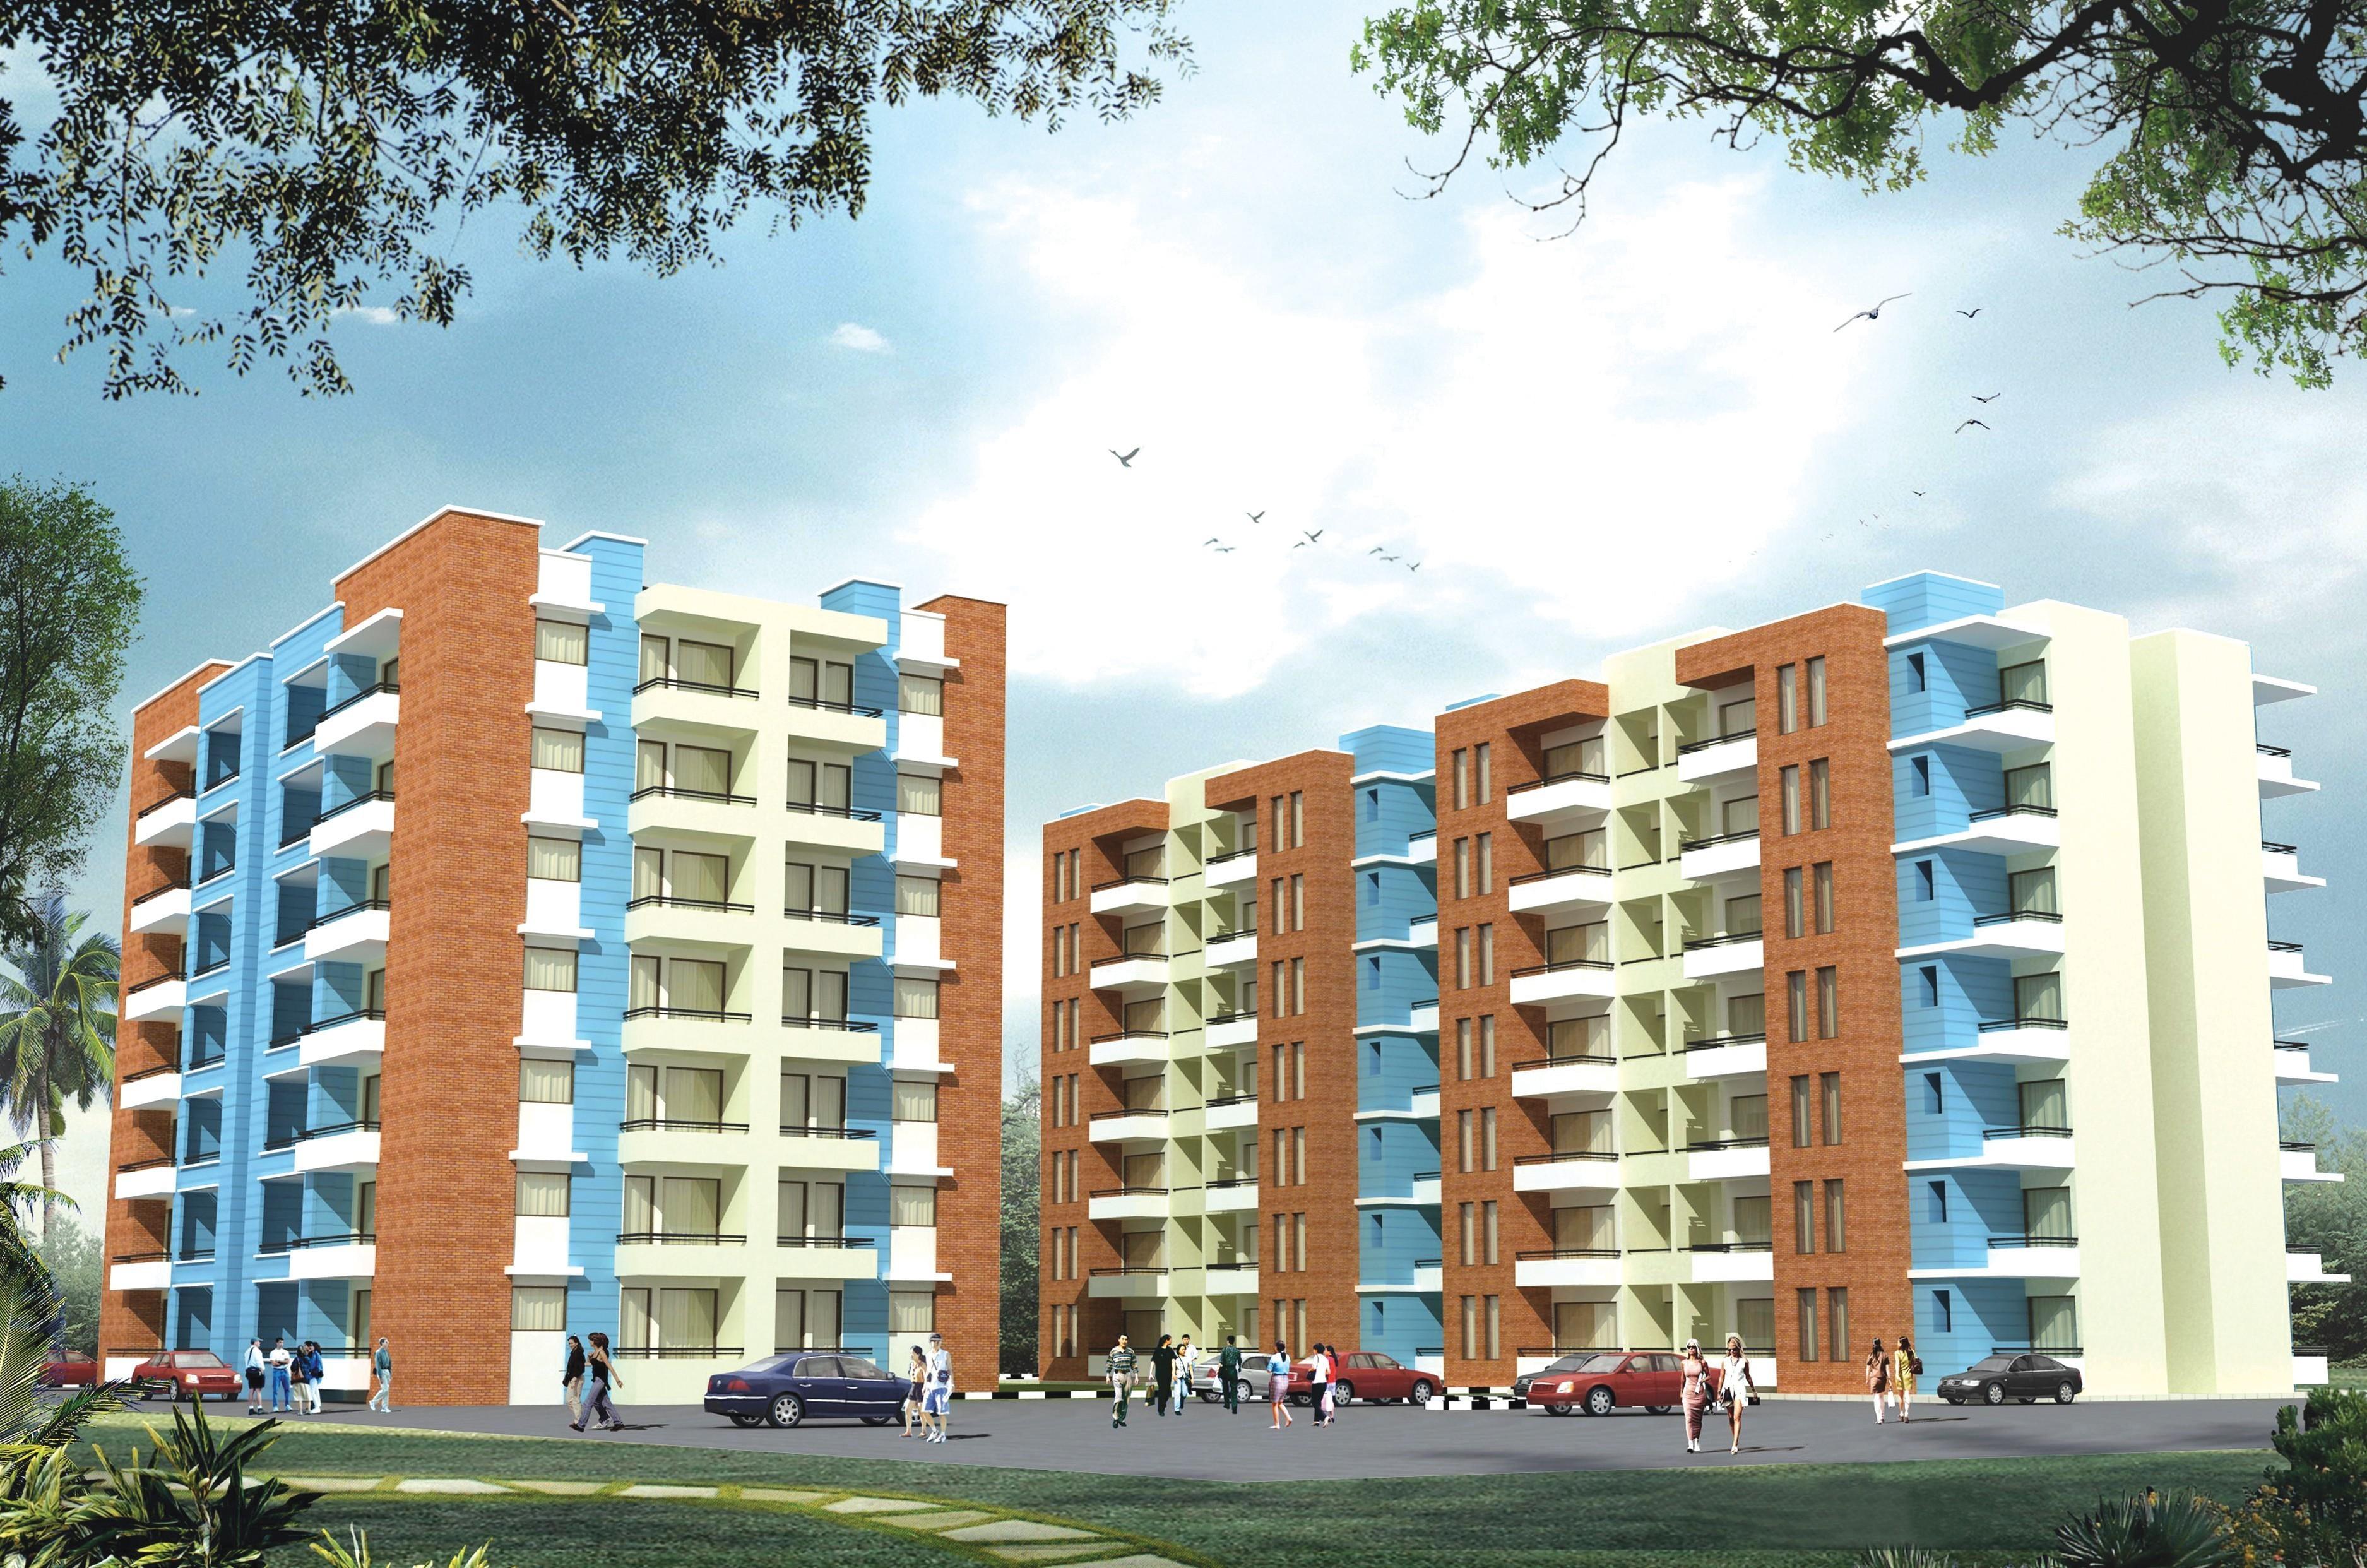 simrit towers kharar mohali flats in kharar mohali flats in mohali 2bhk flats in kharar 3bhk flats in kharar flats near chandigarh flats in greater mohali